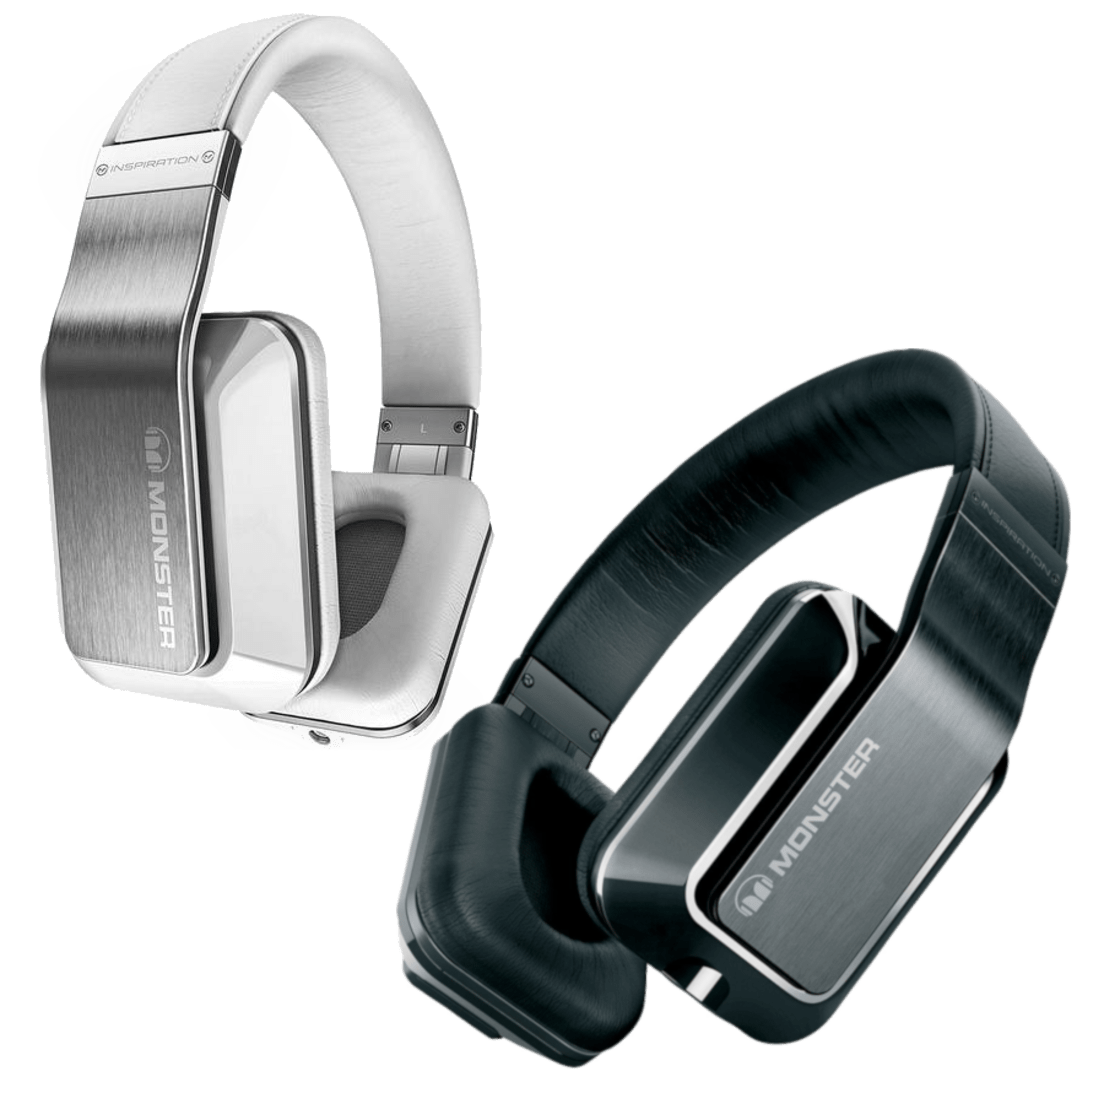 dd35352e4d692c Monster Inspiration Noise Cancelling Over-Ear Headphones (Open Box)